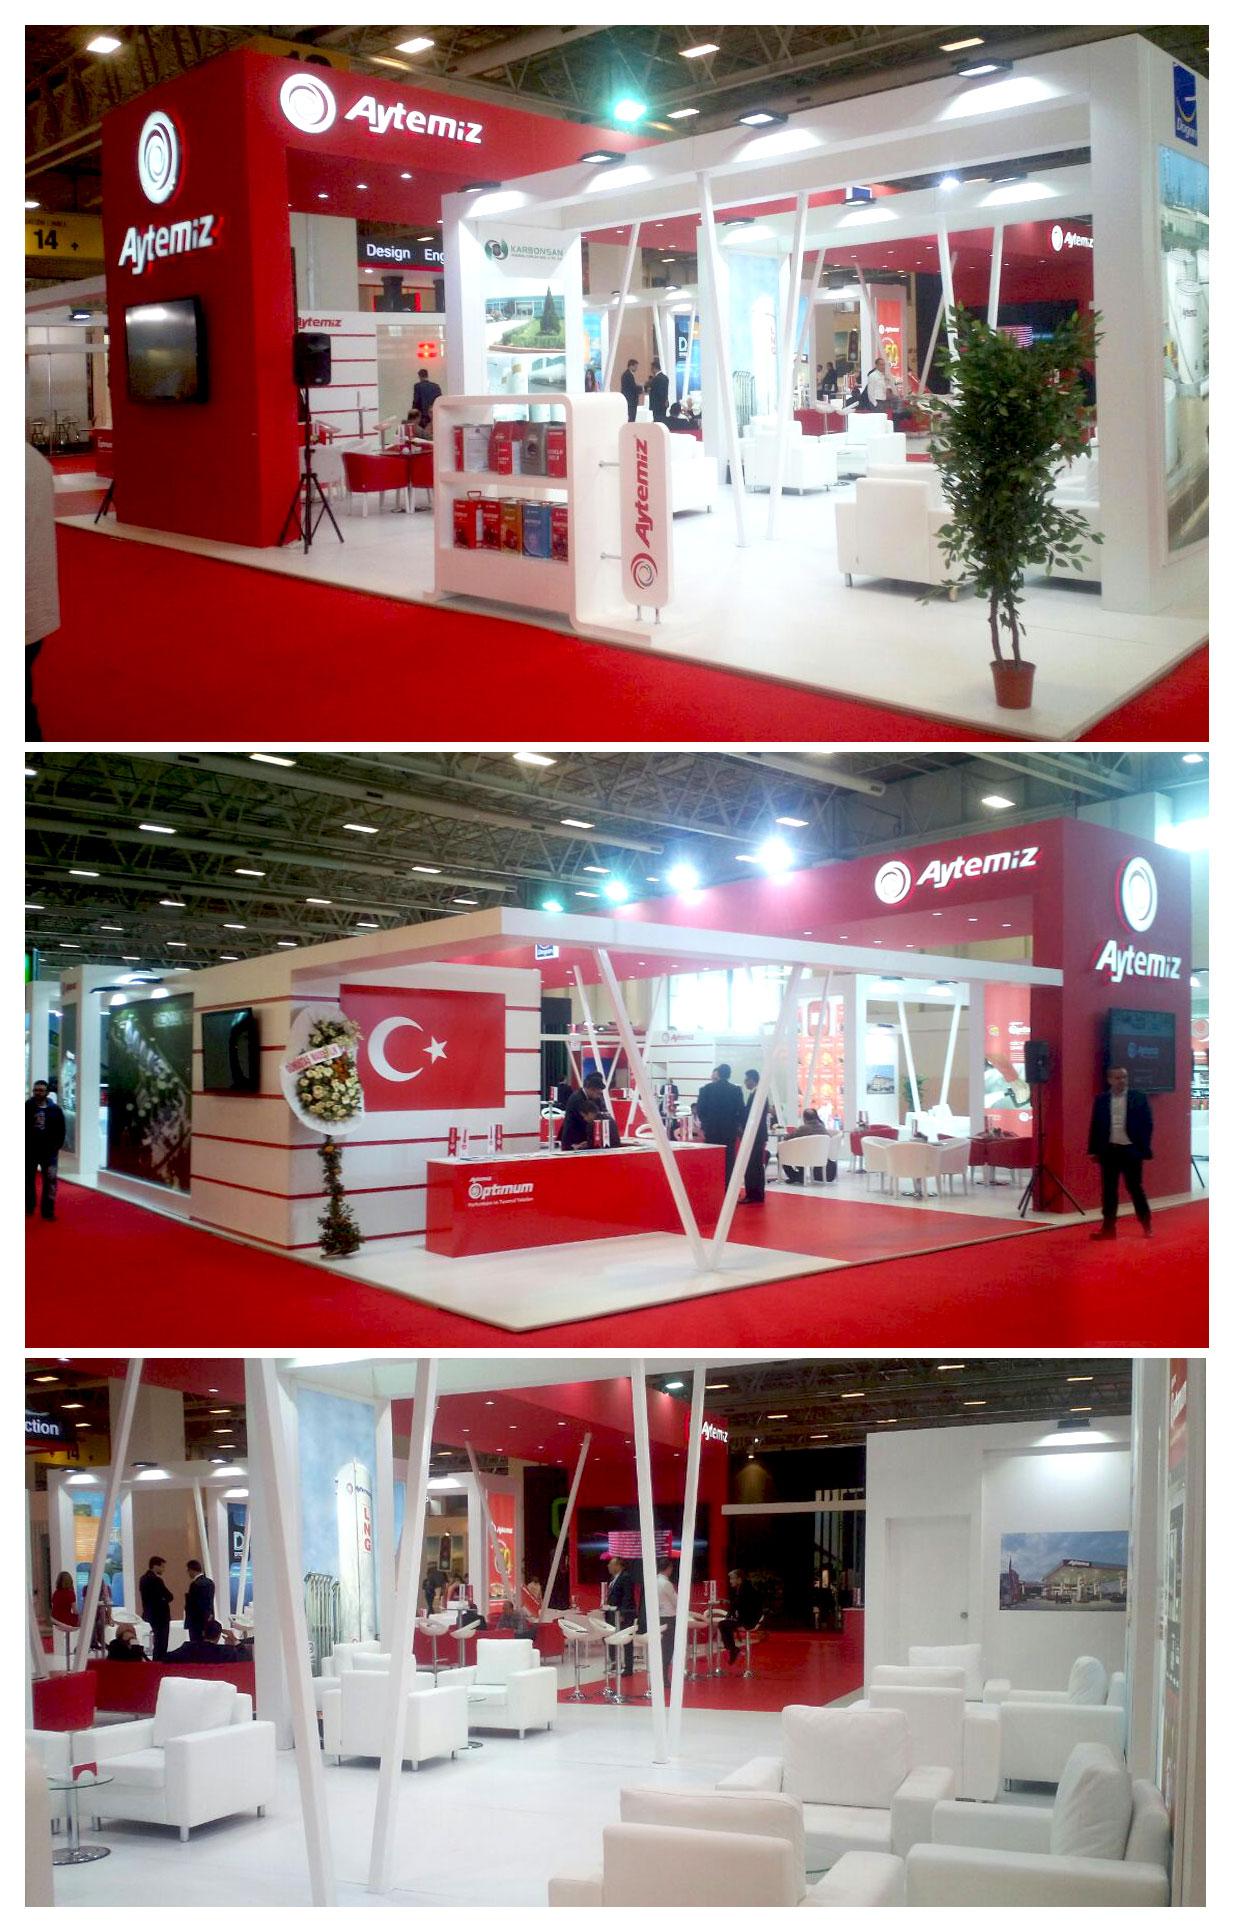 Aytemiz Exhibition Stand Design Photo